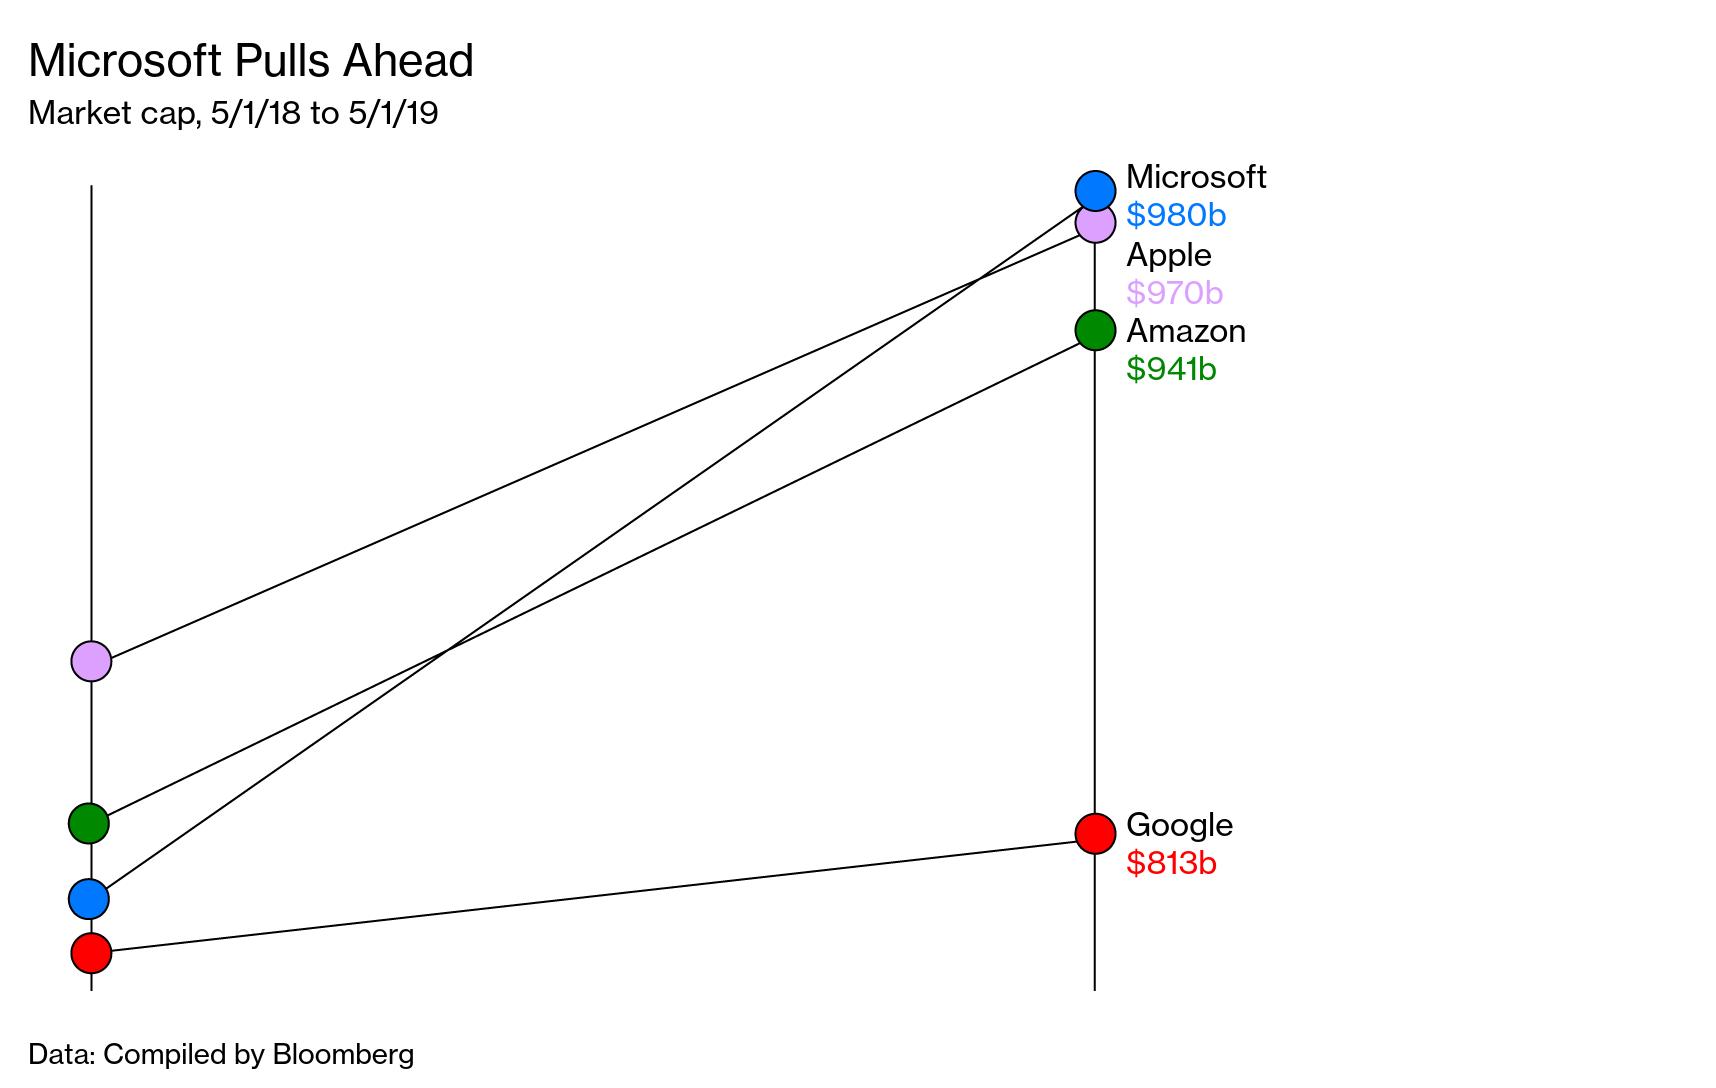 Satya Nadella Remade Microsoft as World's Most Valuable Company